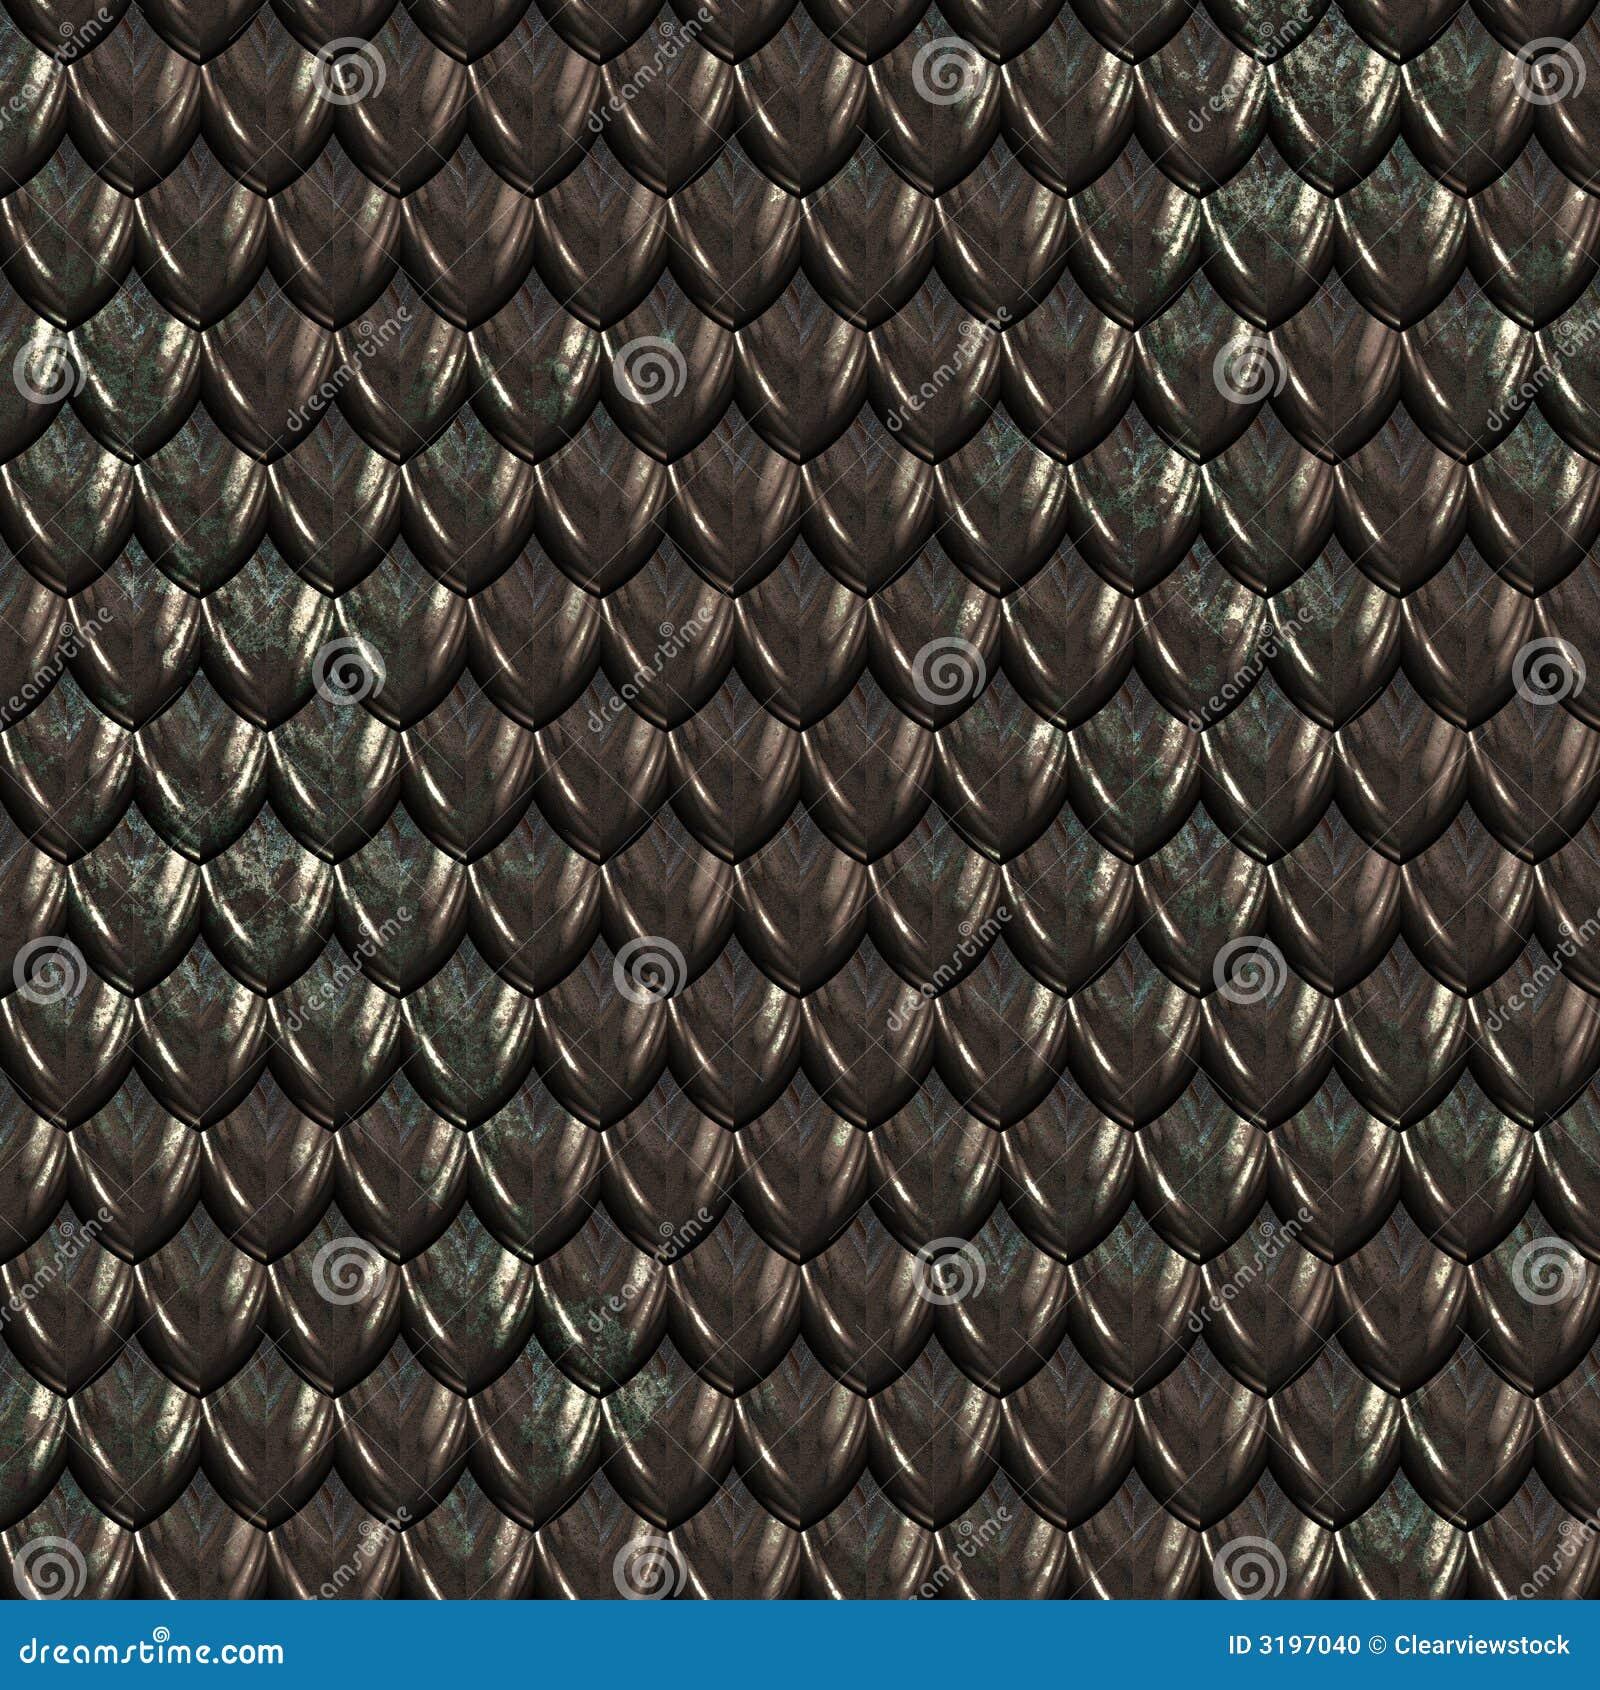 black dragon skin scales